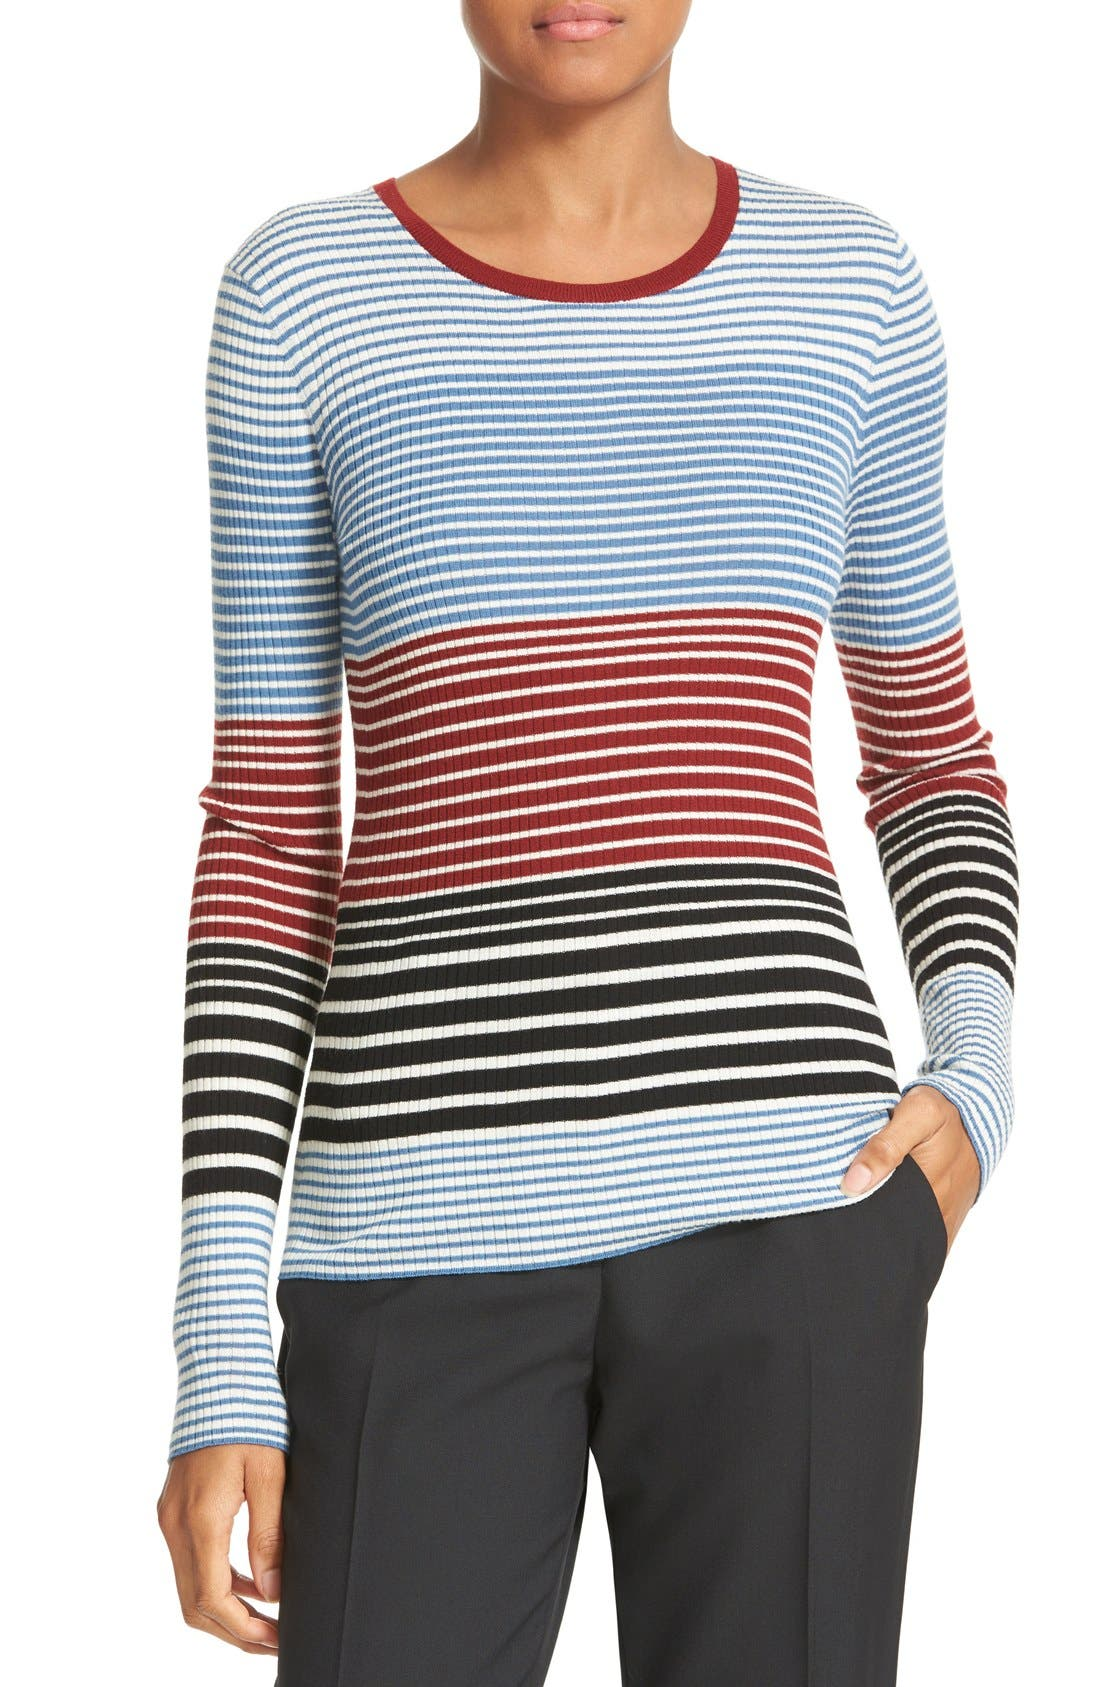 Alternate Image 1 Selected - Theory Mirzi Stripe Rib Knit Merino Sweater